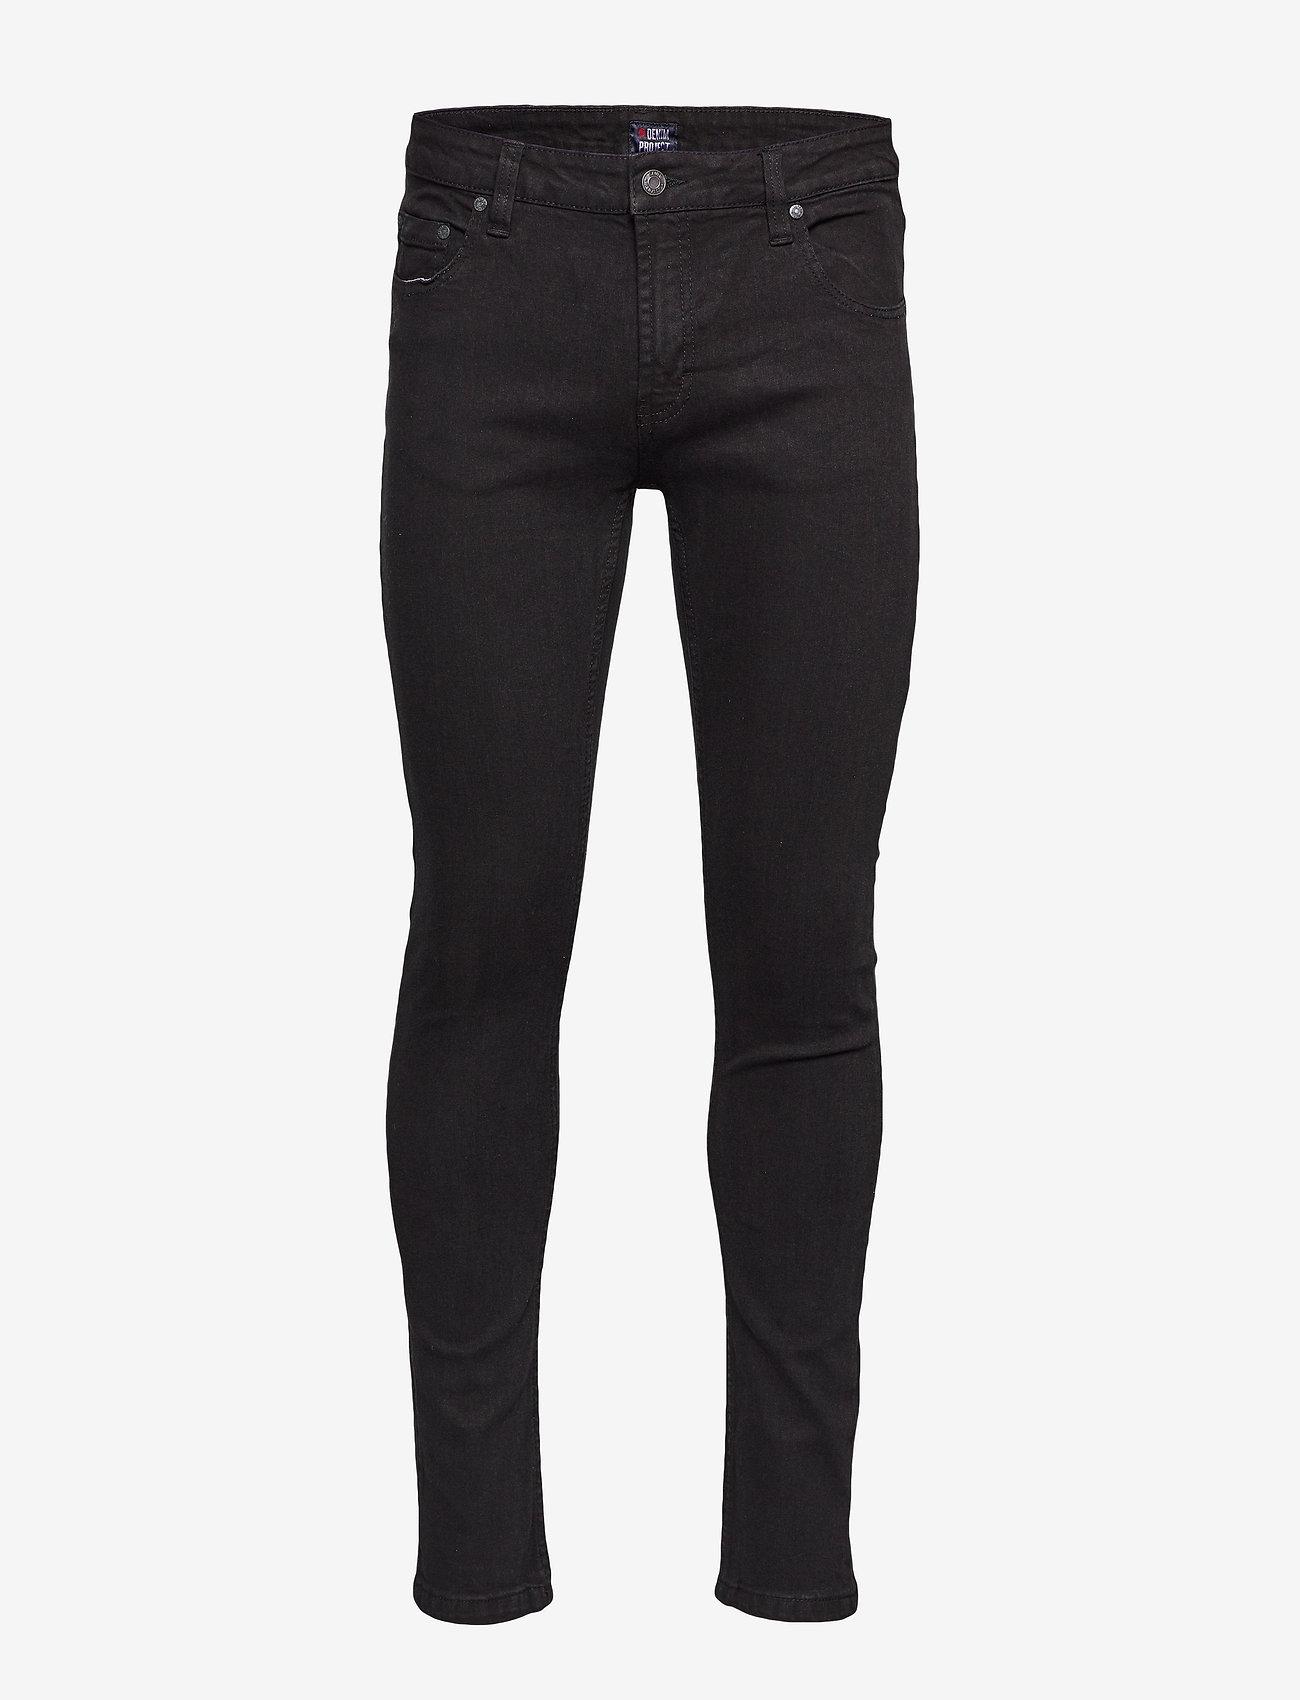 Denim project - Mr. Red - skinny jeans - black - 0